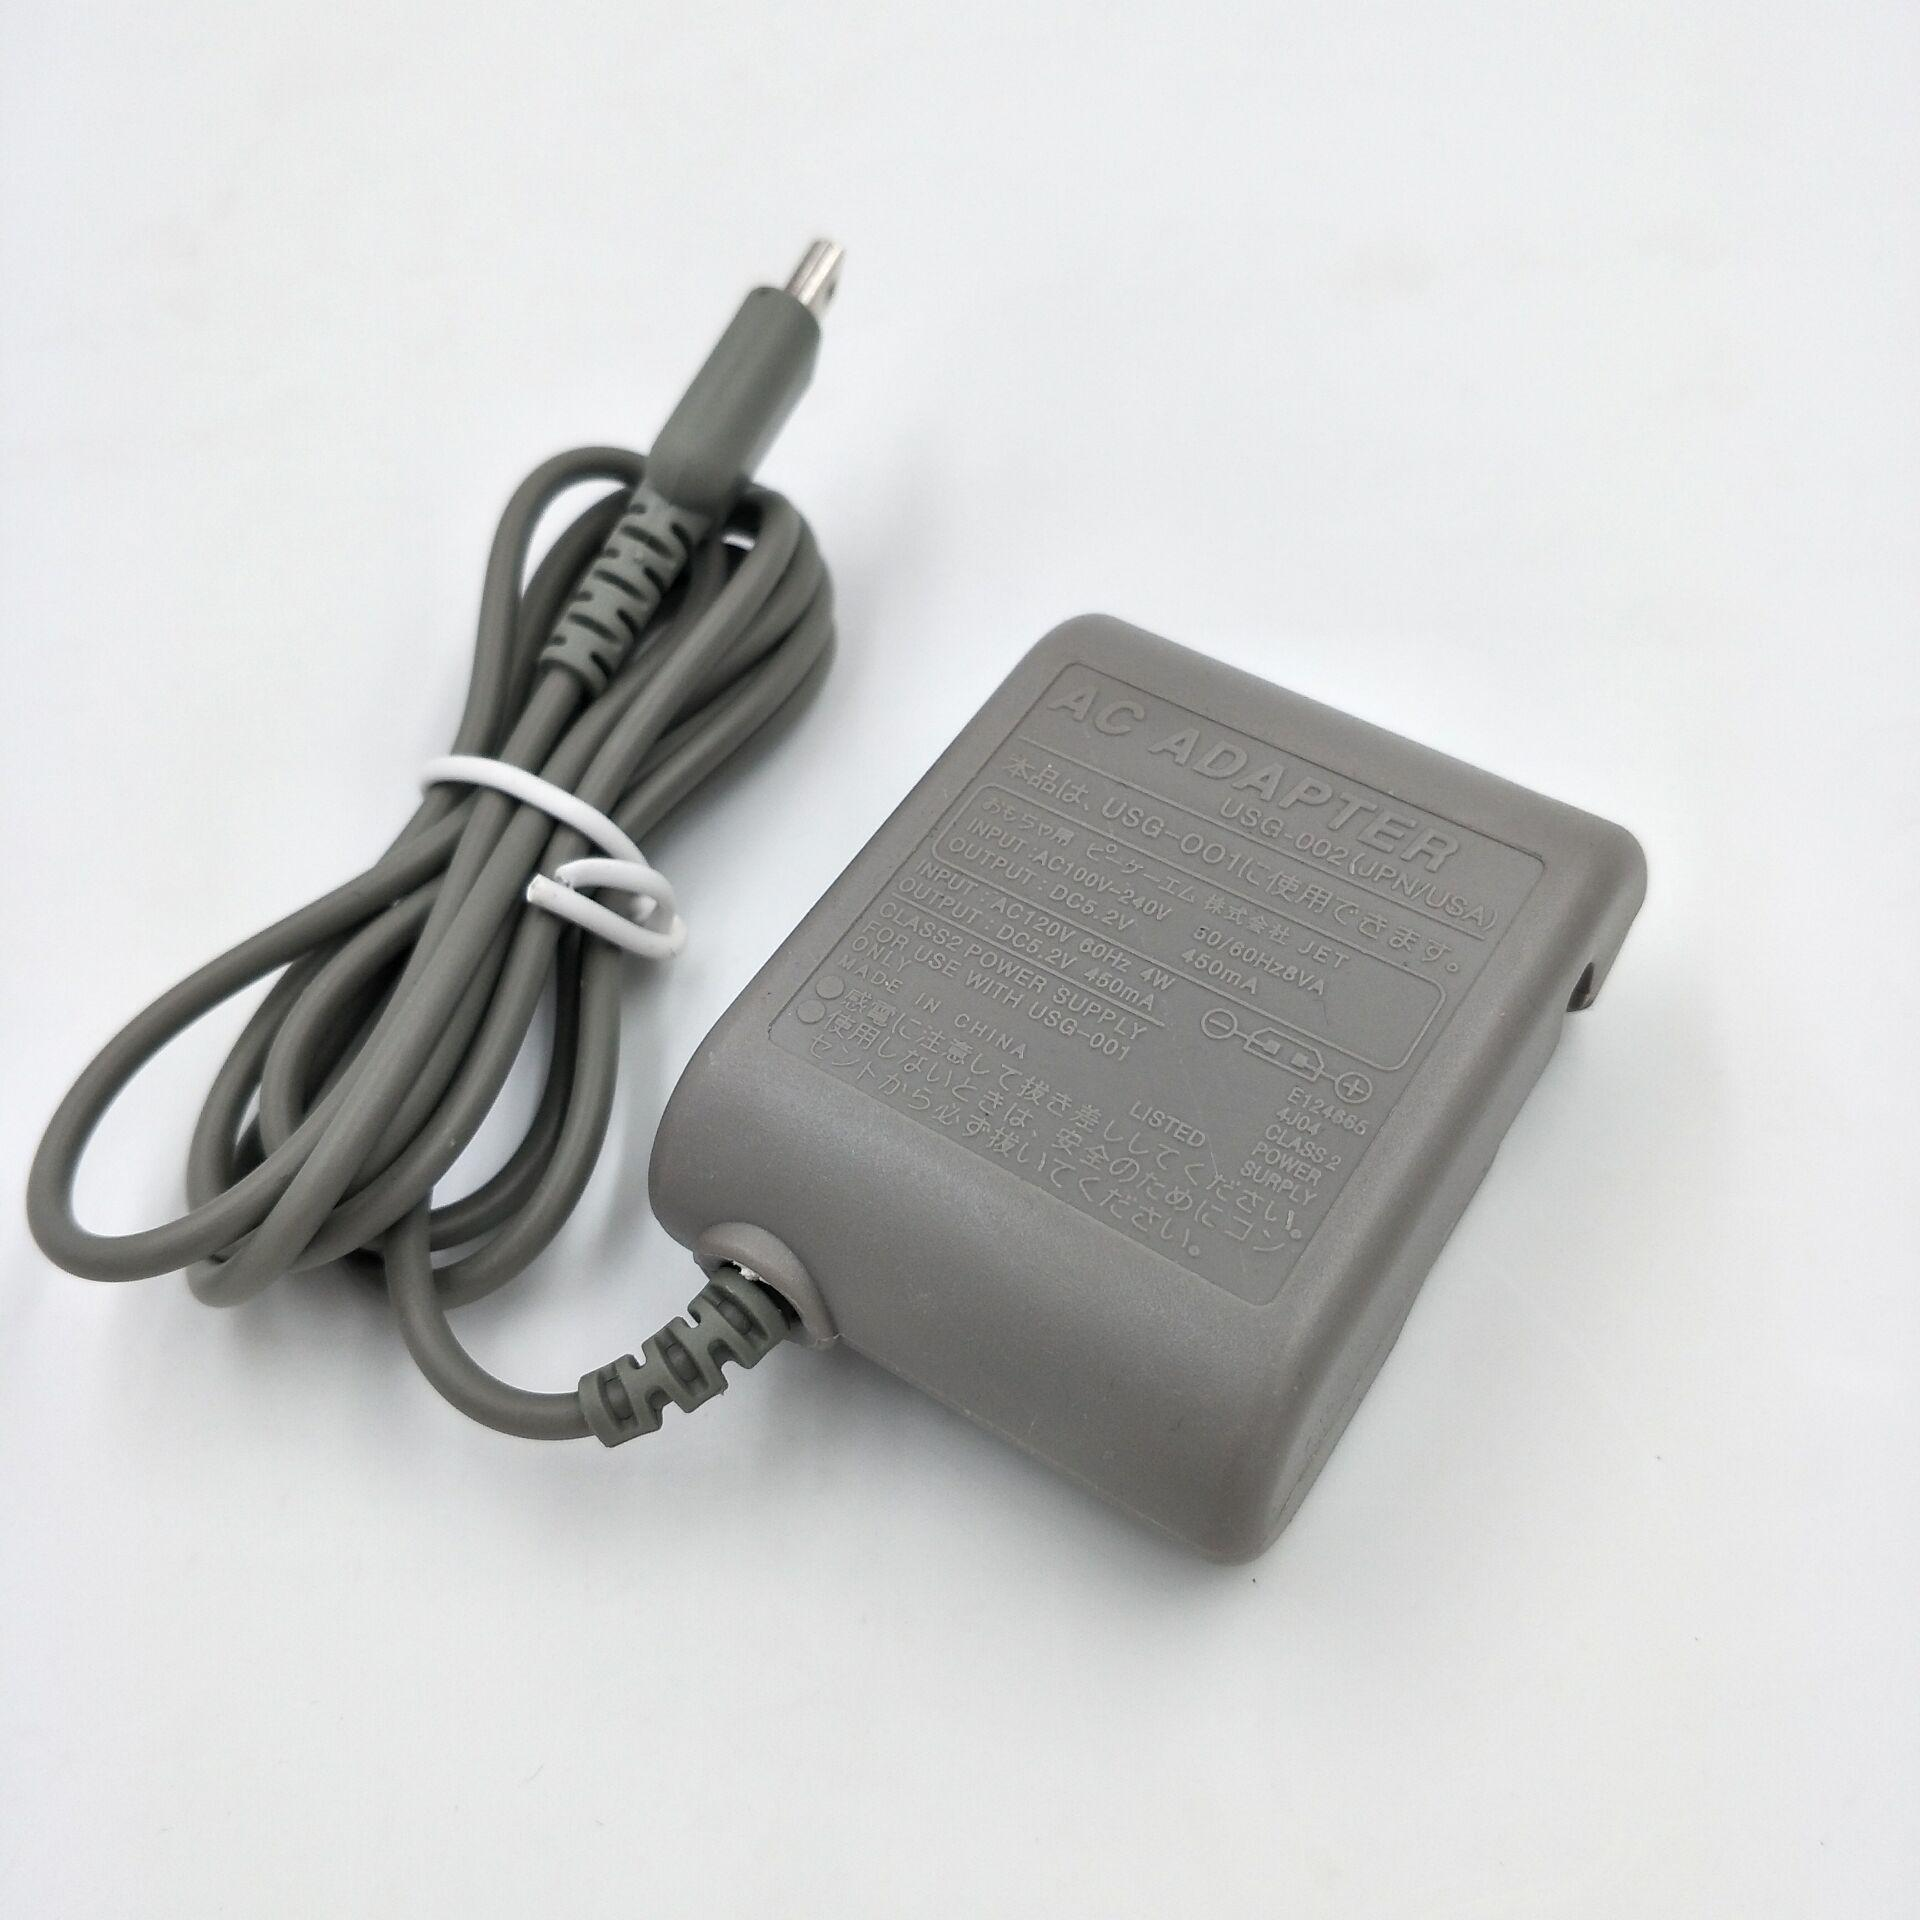 US 플러그 AC 전원 공급 장치 어댑터 벽 여행용 충전기 NINTENDO NDS Lite NDSL DSL 콘솔